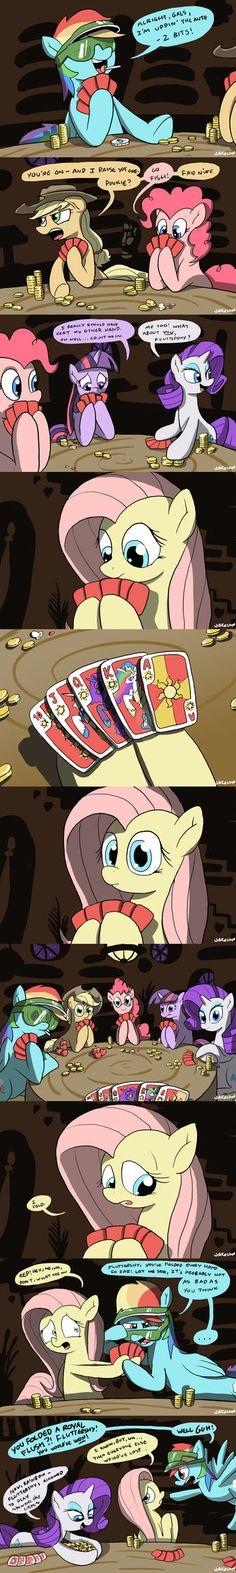 Gambling Ponies.... (I don't like that their gambling but it's still pretty funny!)